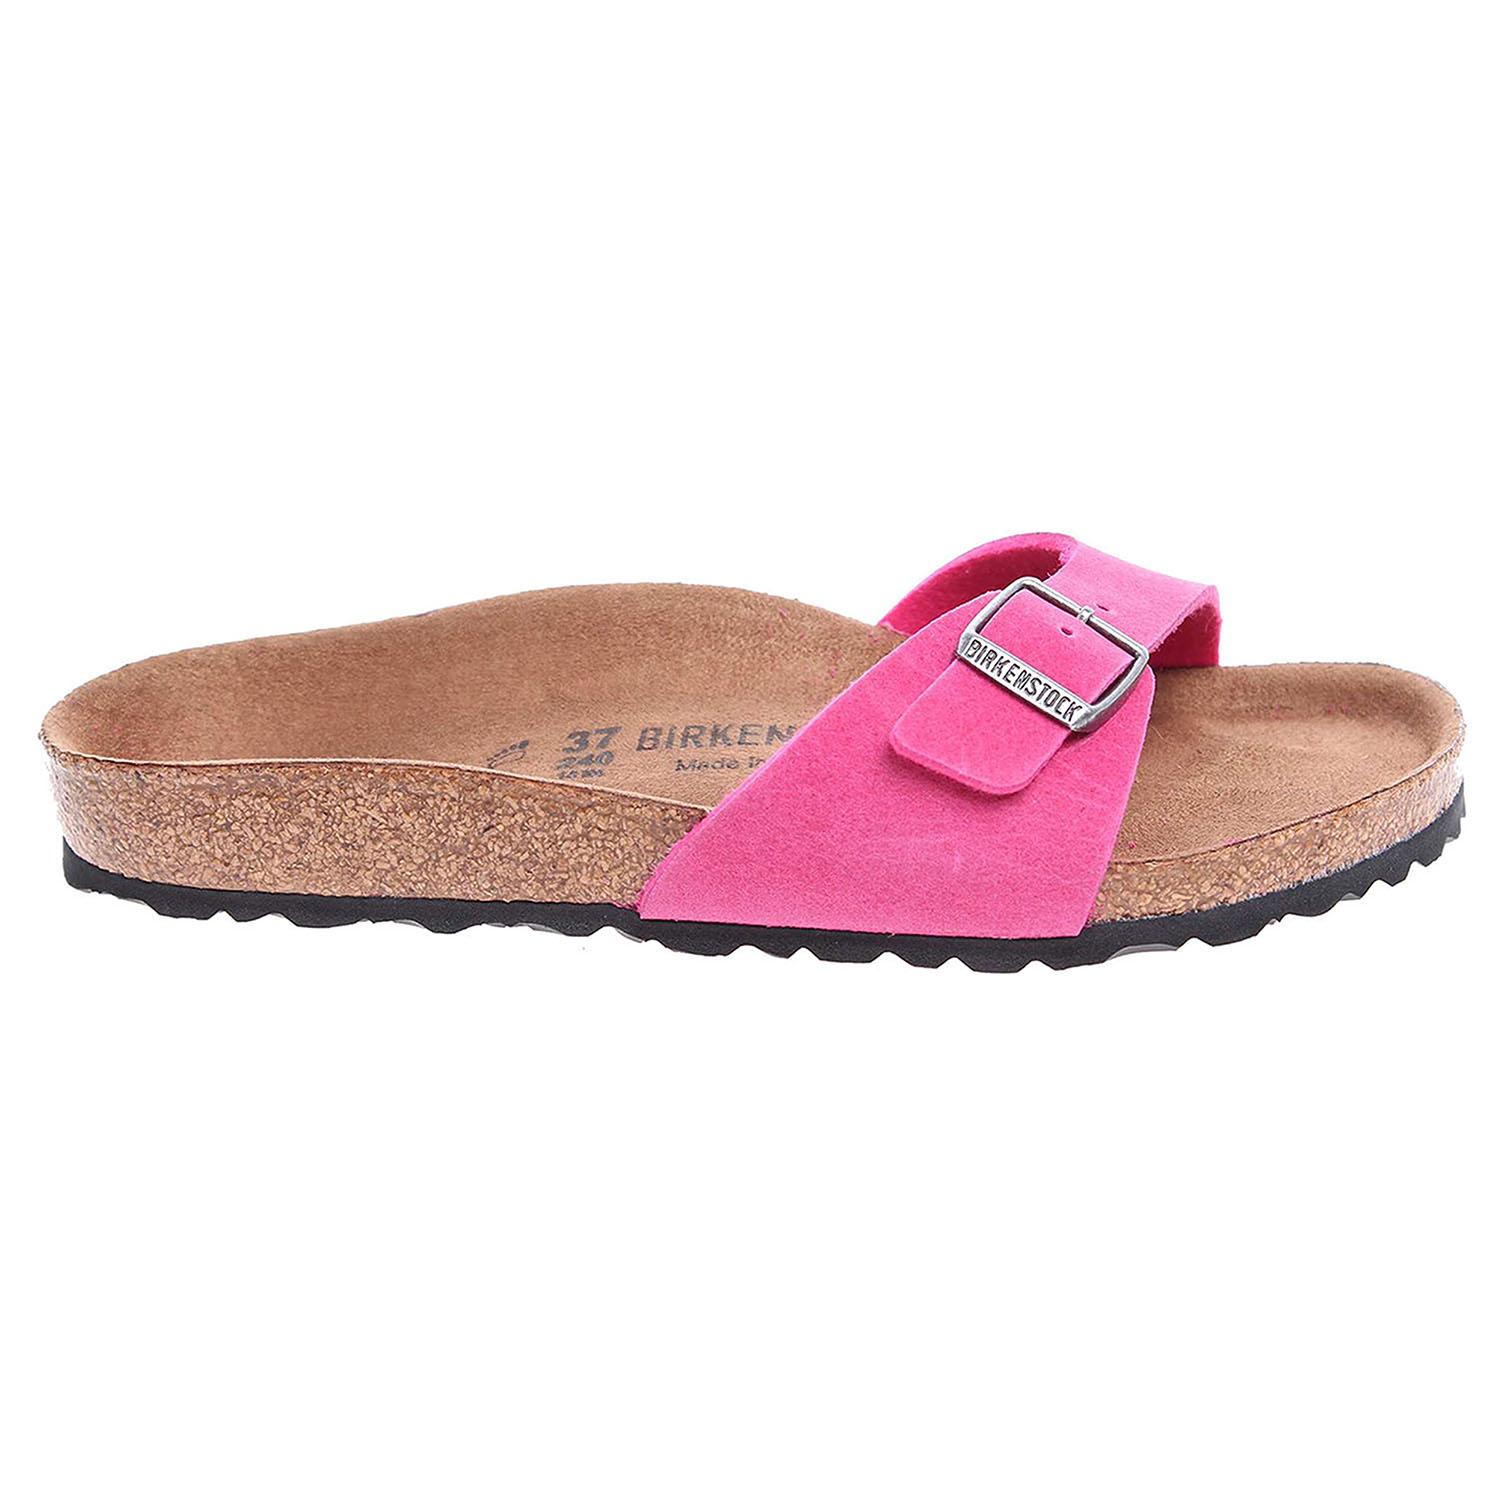 Ecco Birkenstock Madrid dámské pantofle 438101 růžové 23400300